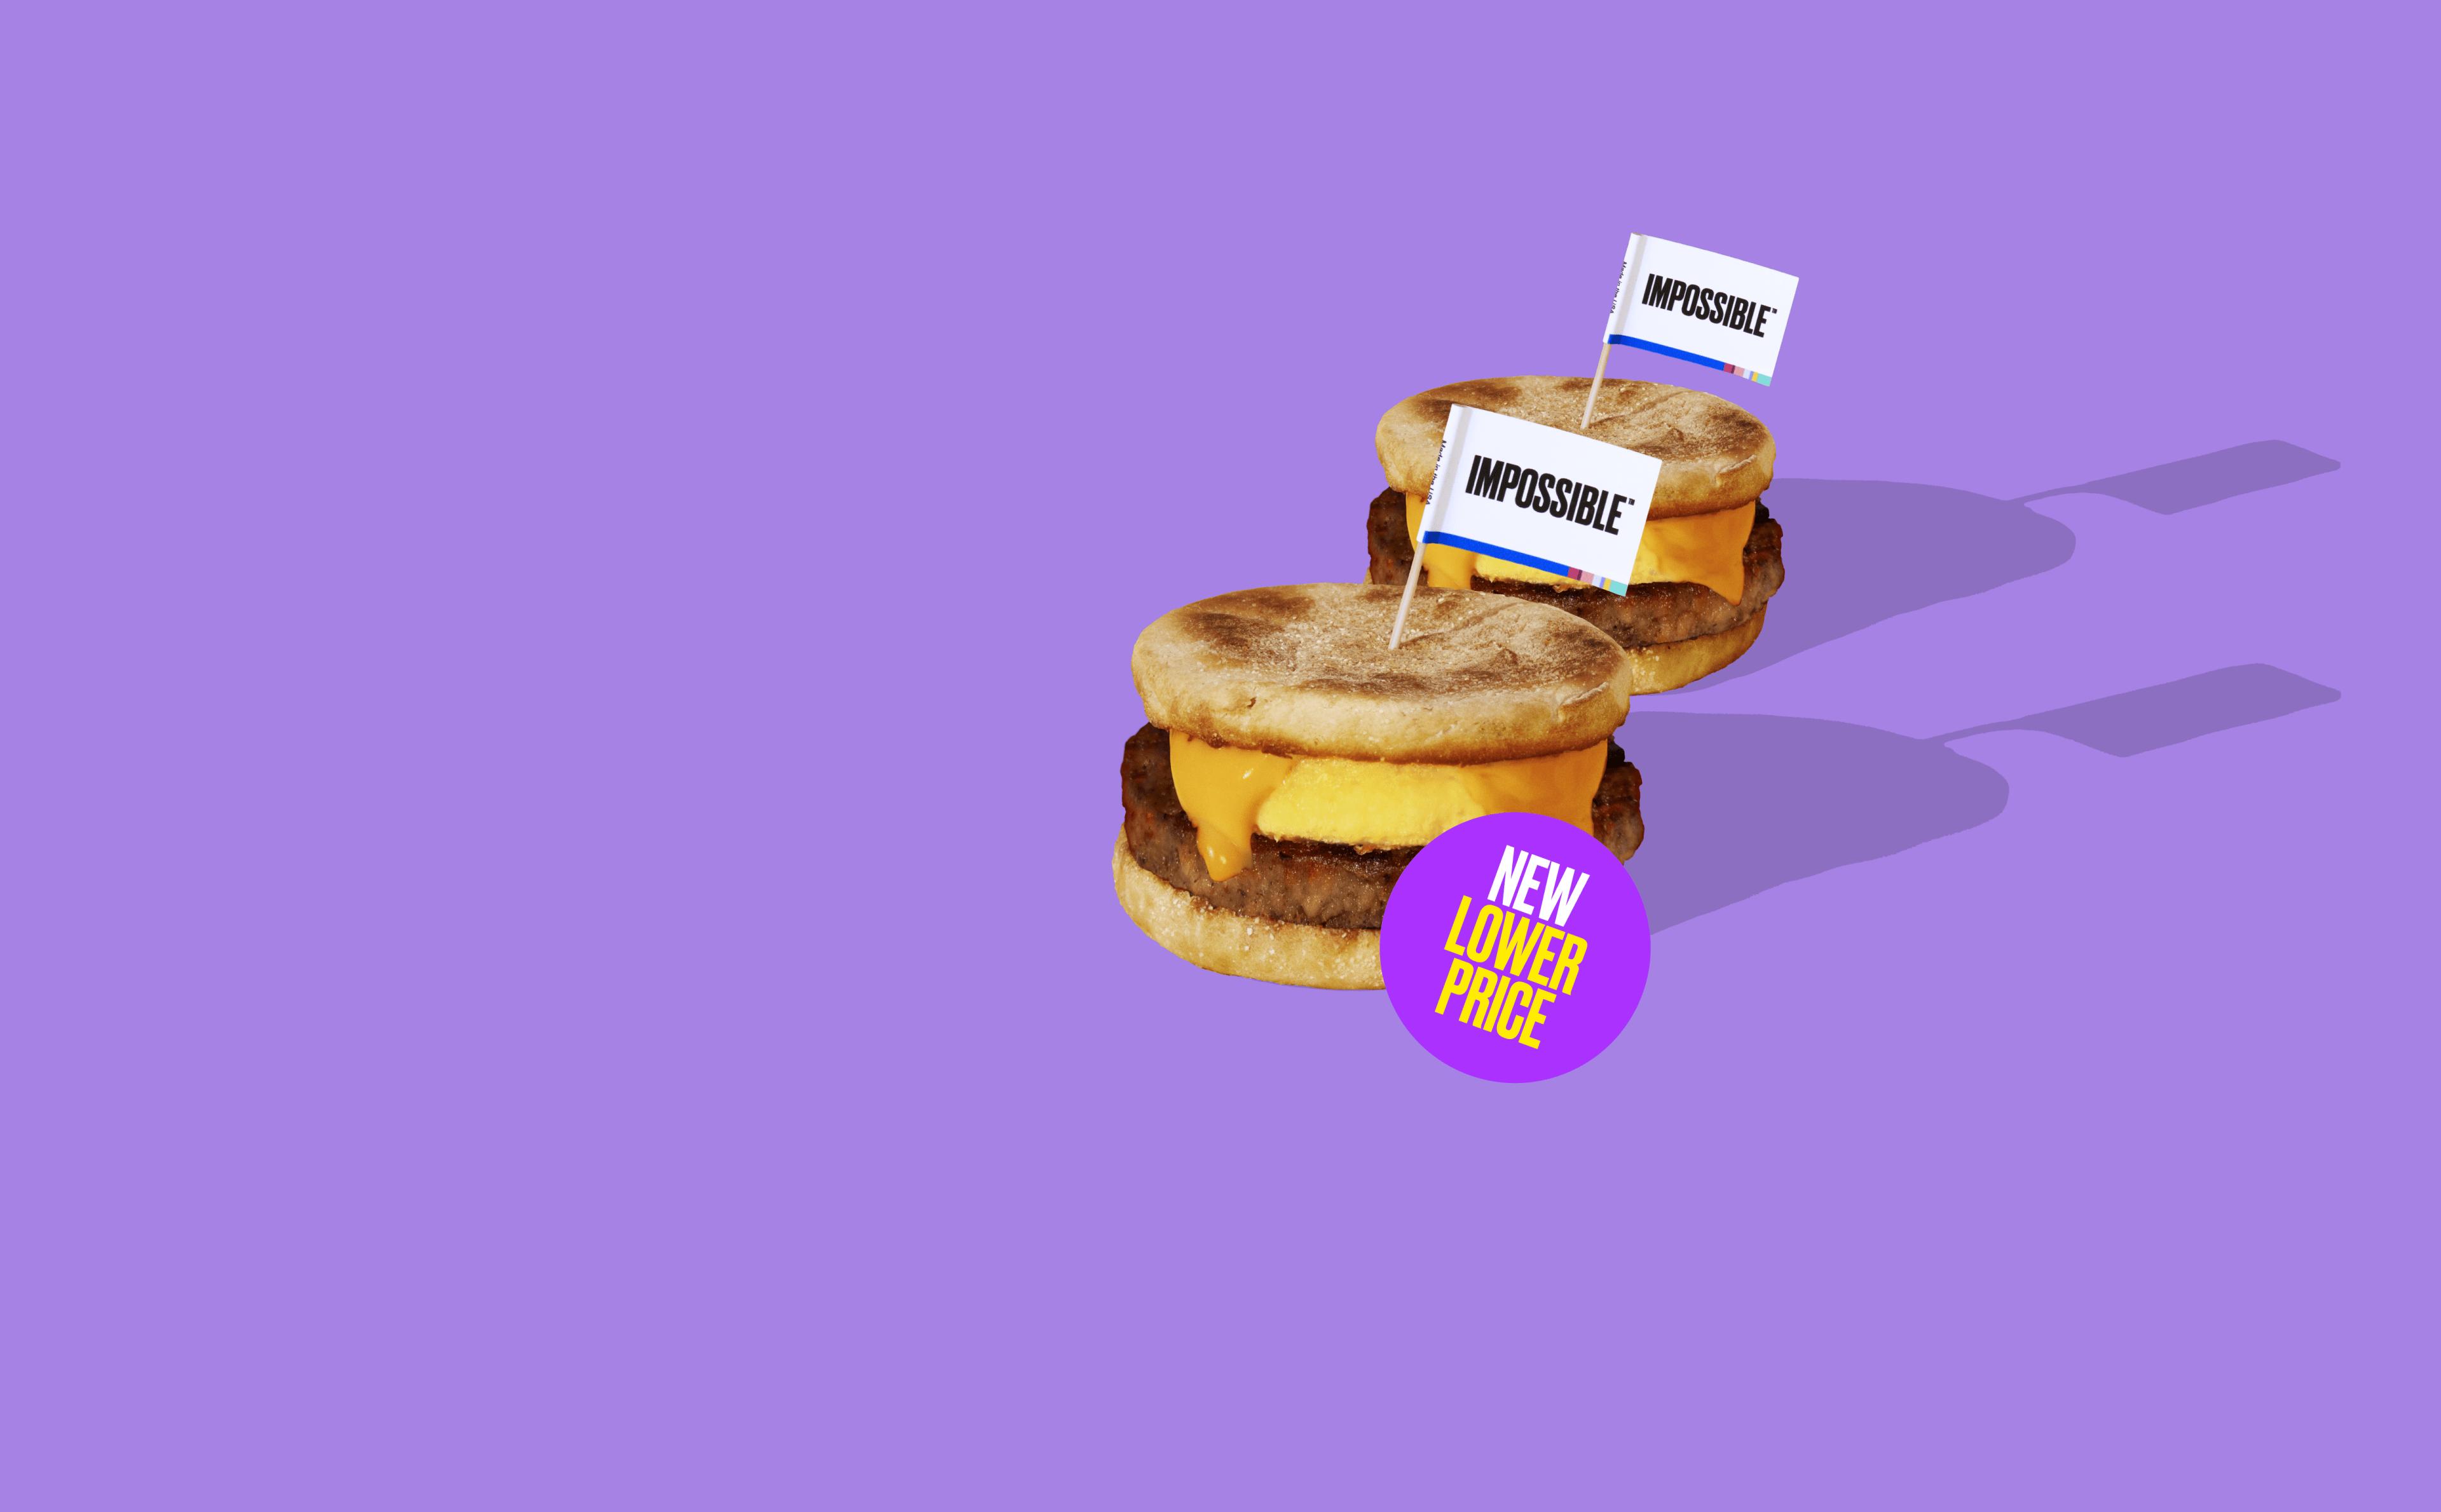 Impossible Sausage breakfast sandwich new lower prices sticker